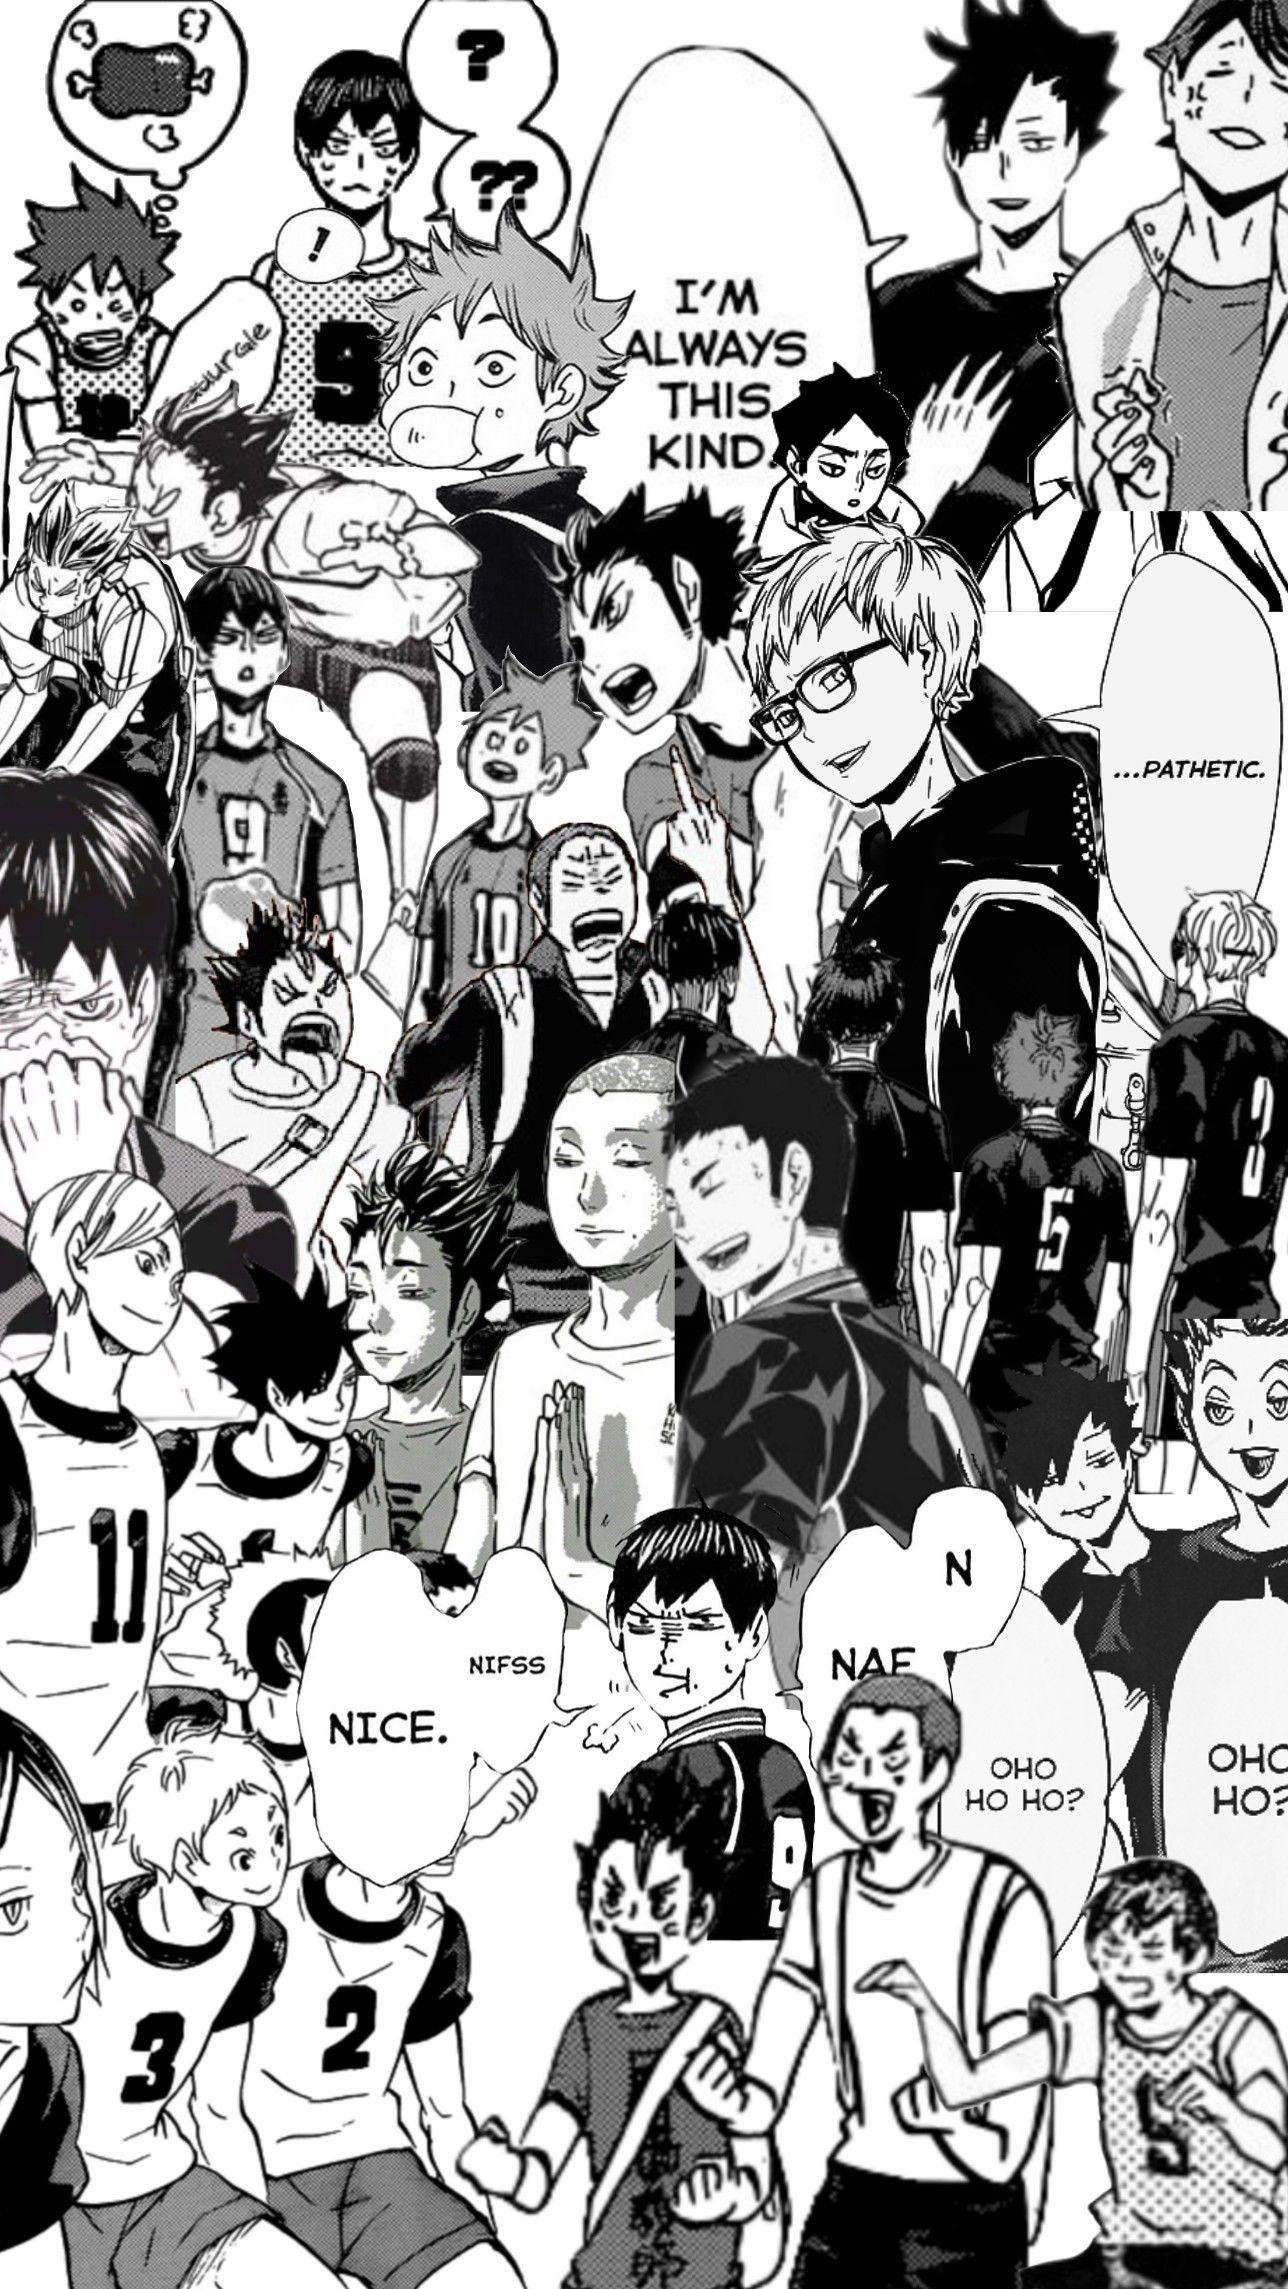 haikyuu manga panels desktop wallpaper